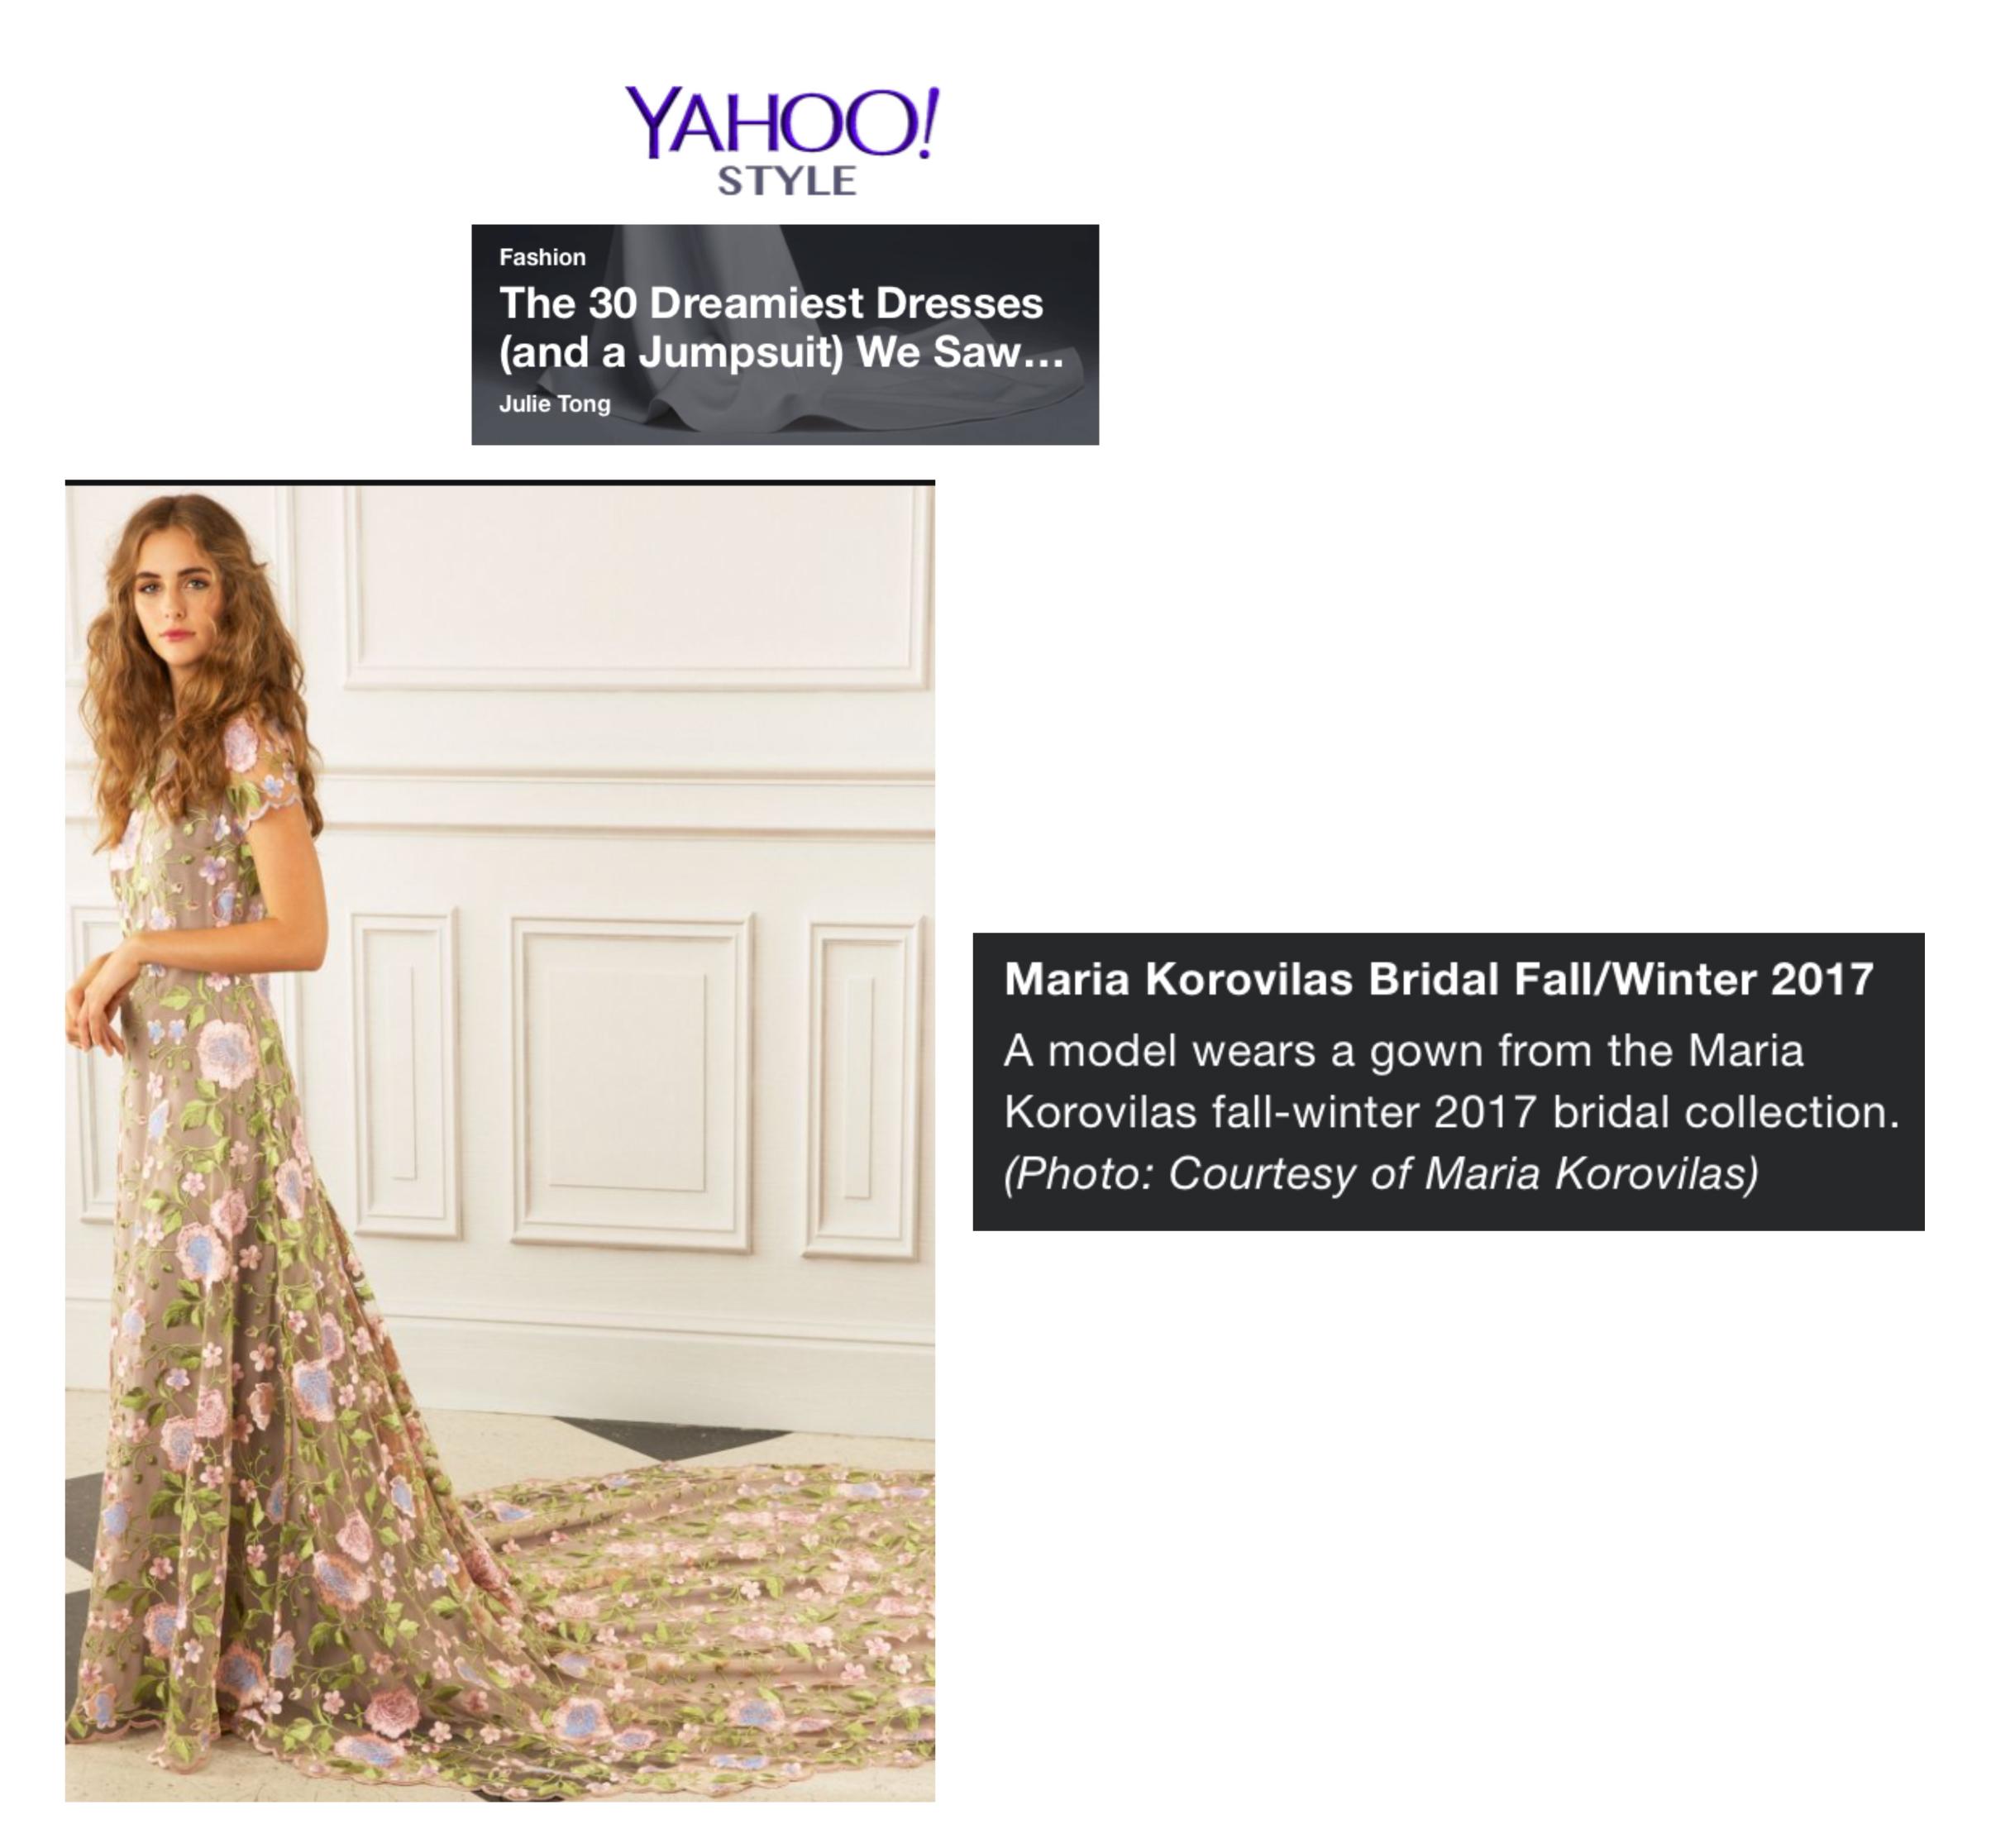 Yahoo! Style, December 2016